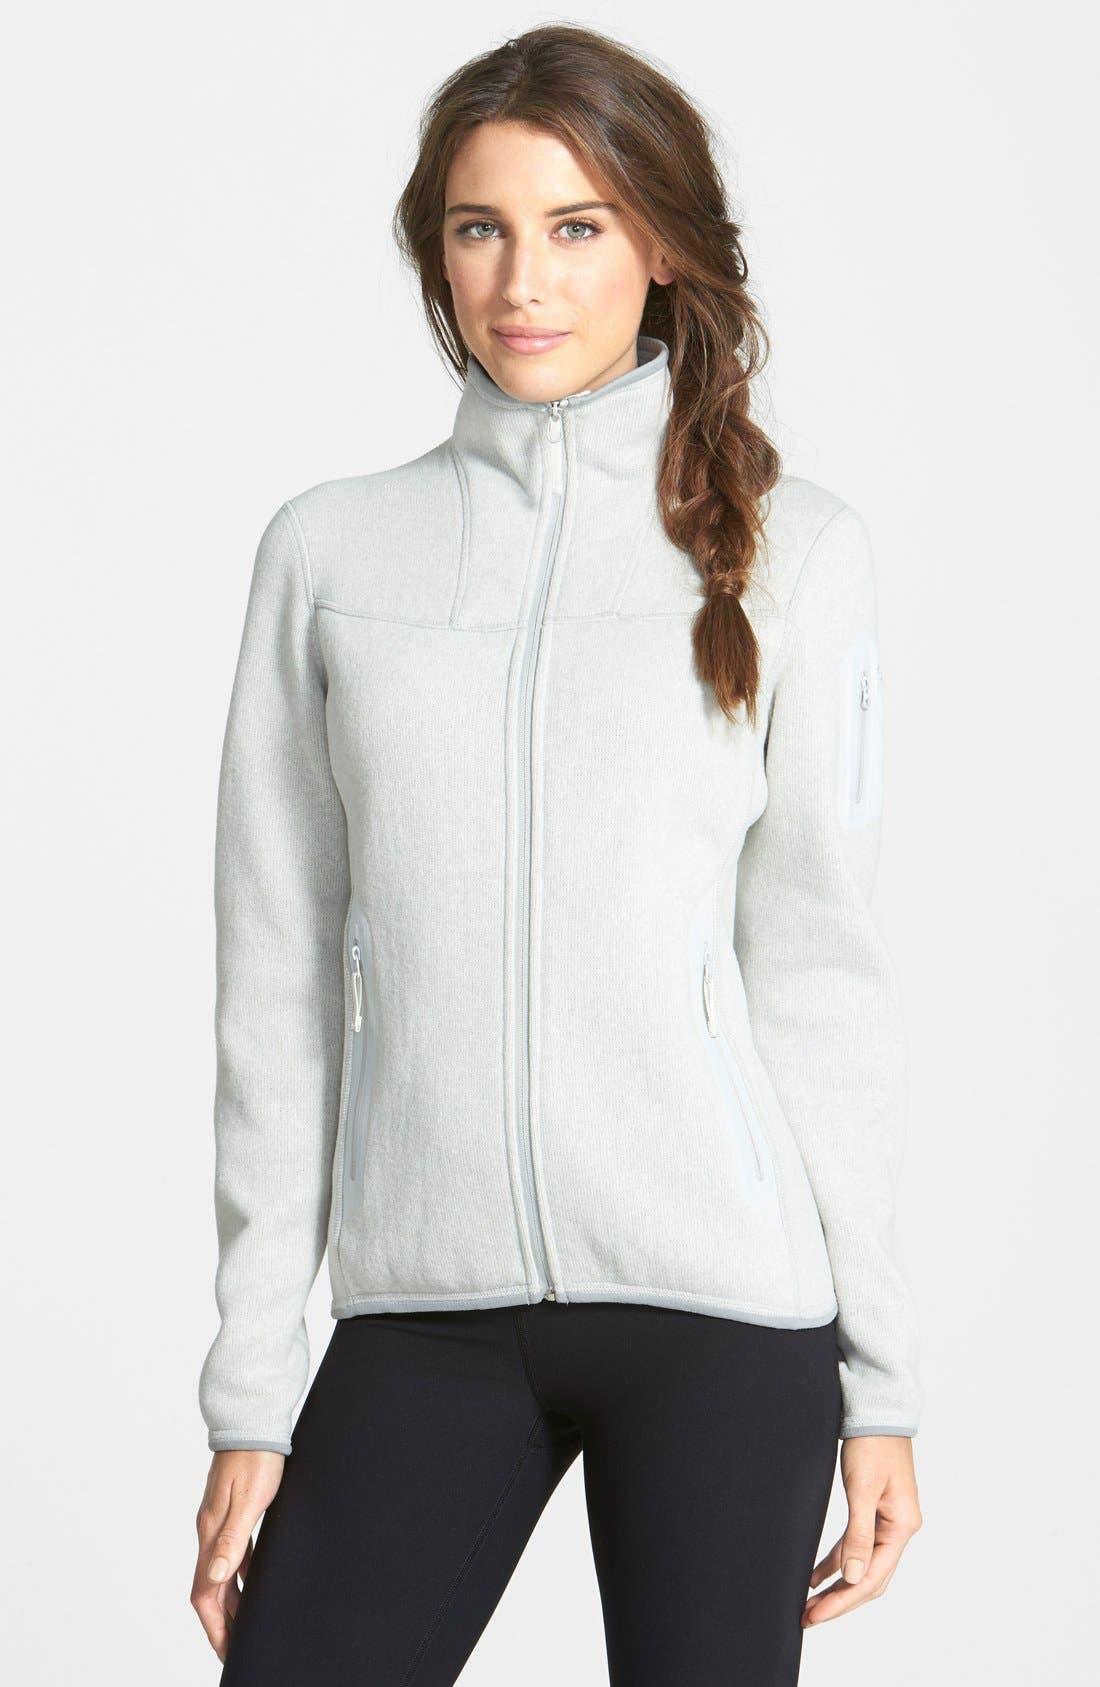 Main Image - Arc'teryx Covert Cardigan Fleece Jacket